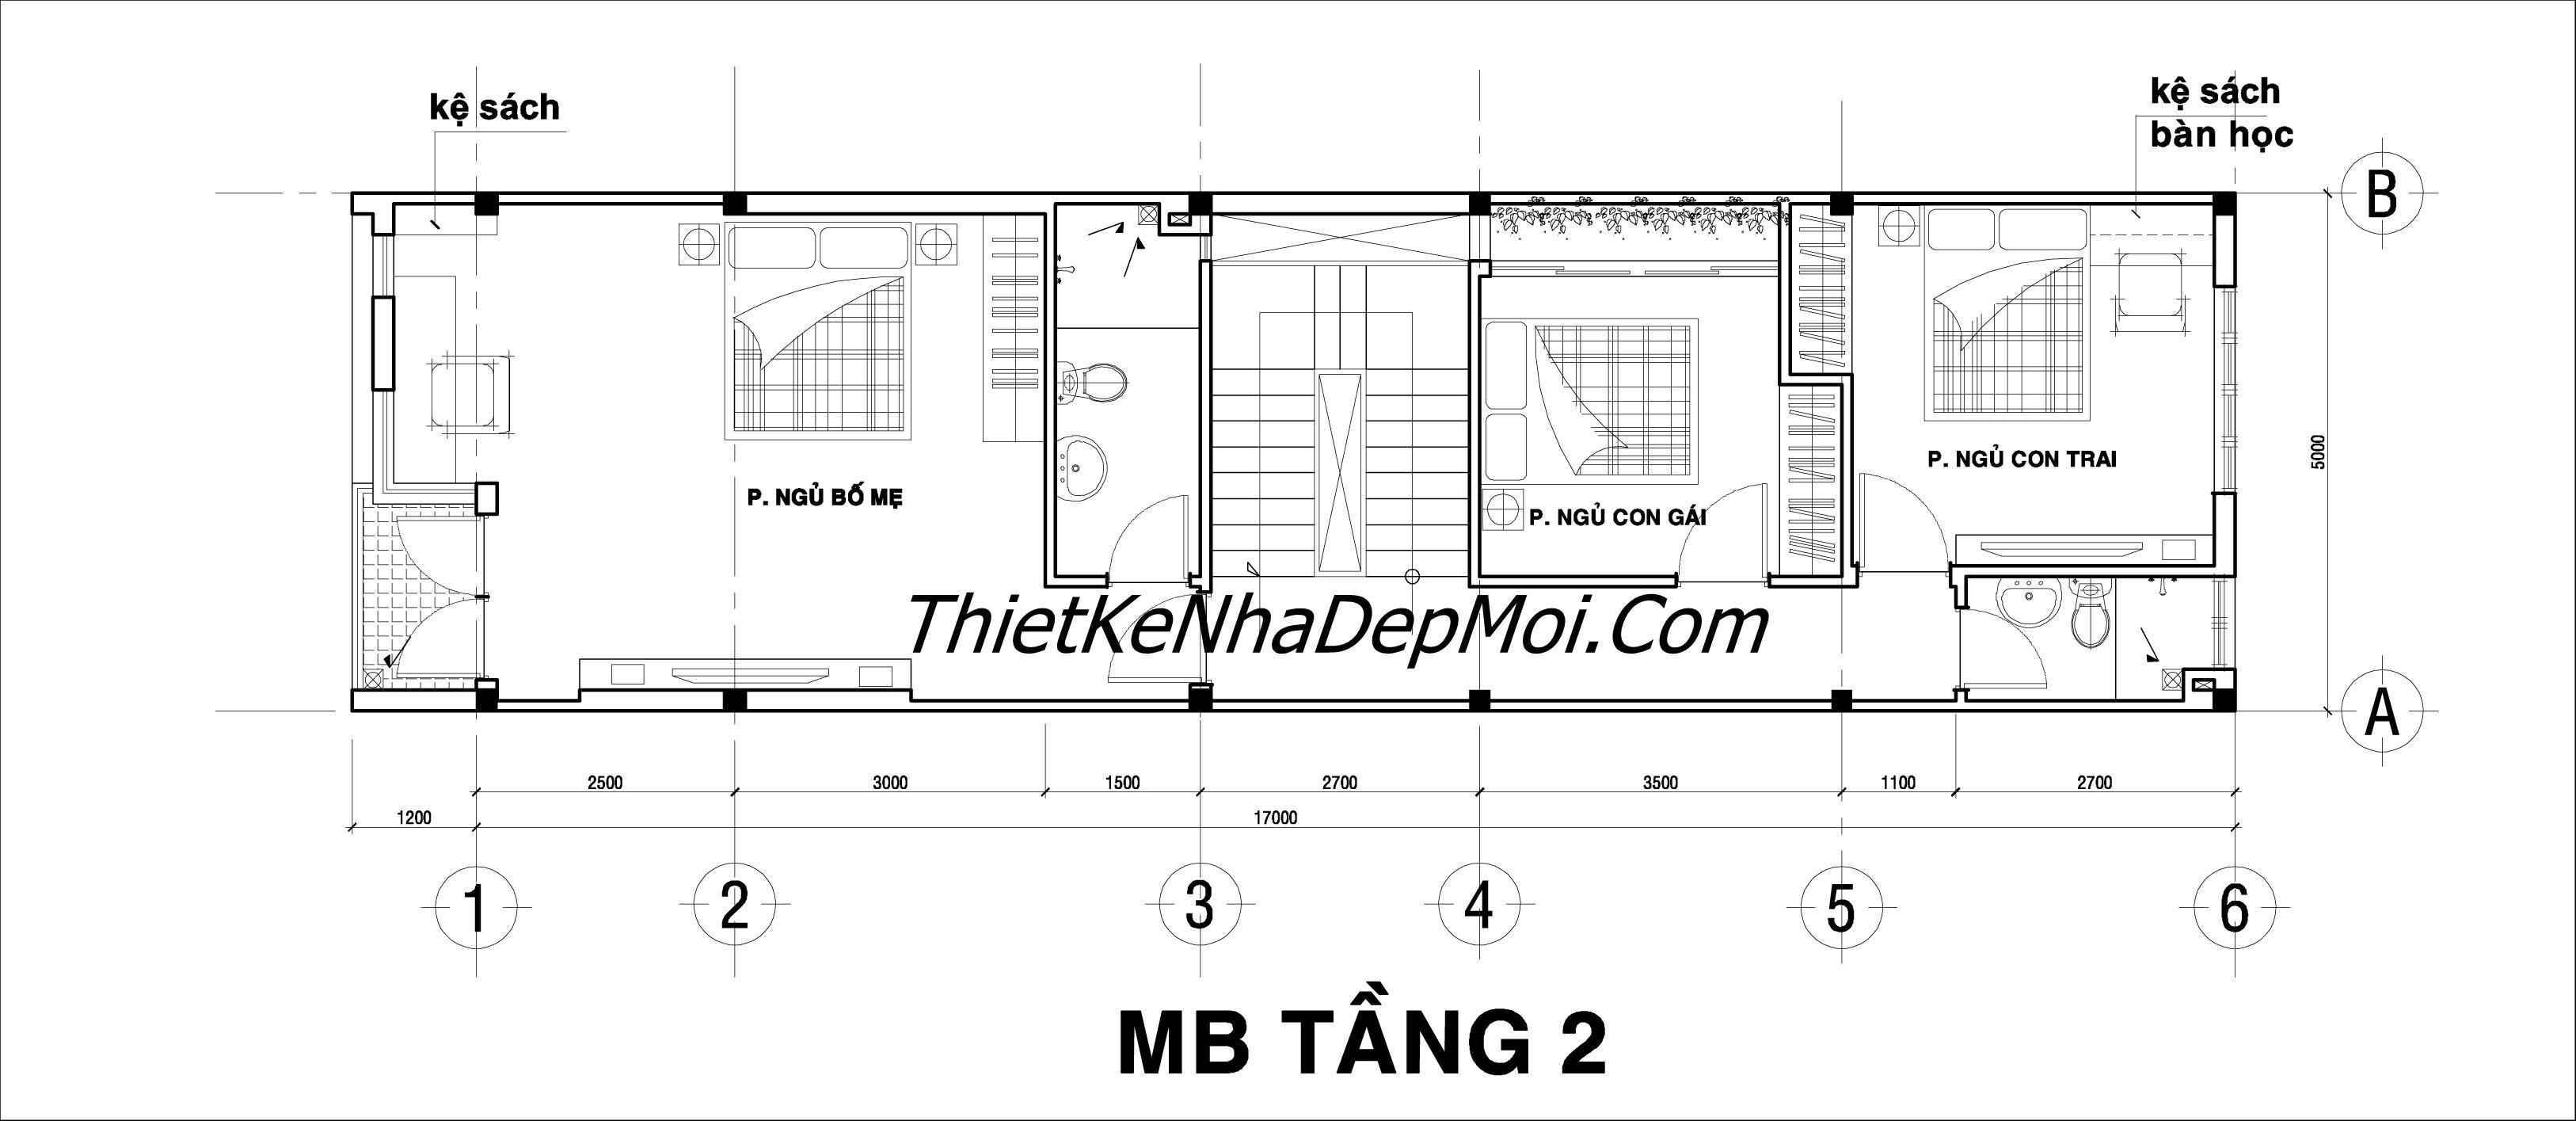 mau-nha-ong-dep-3-tang-1630